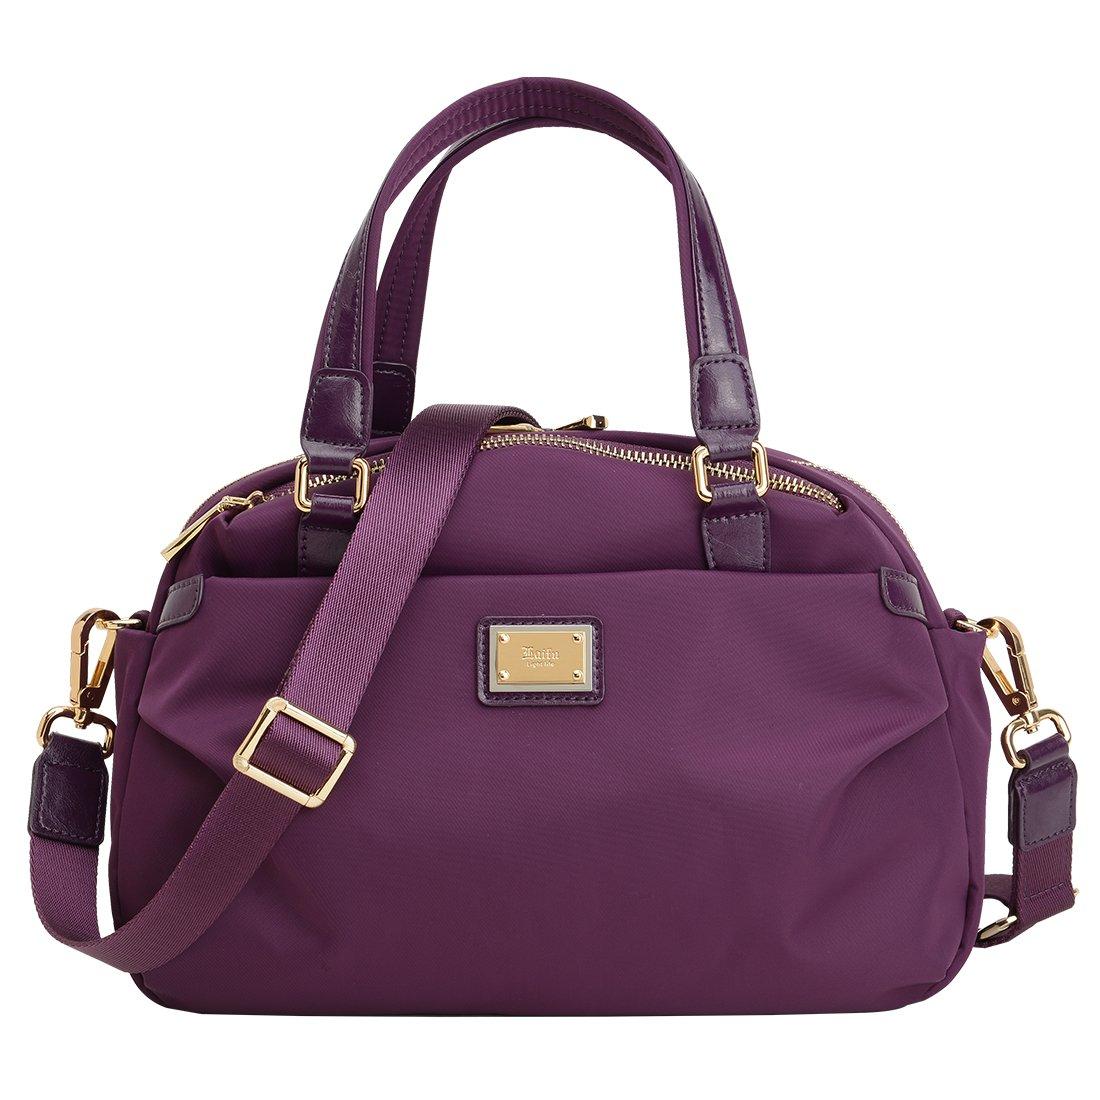 Women's Nylon Handbag Casual Crossbody Bag Laifu Waterpoof Singer Bag Dual Use Perfect for Outdoor,Weekend ,Shopping ,Travel, Purple